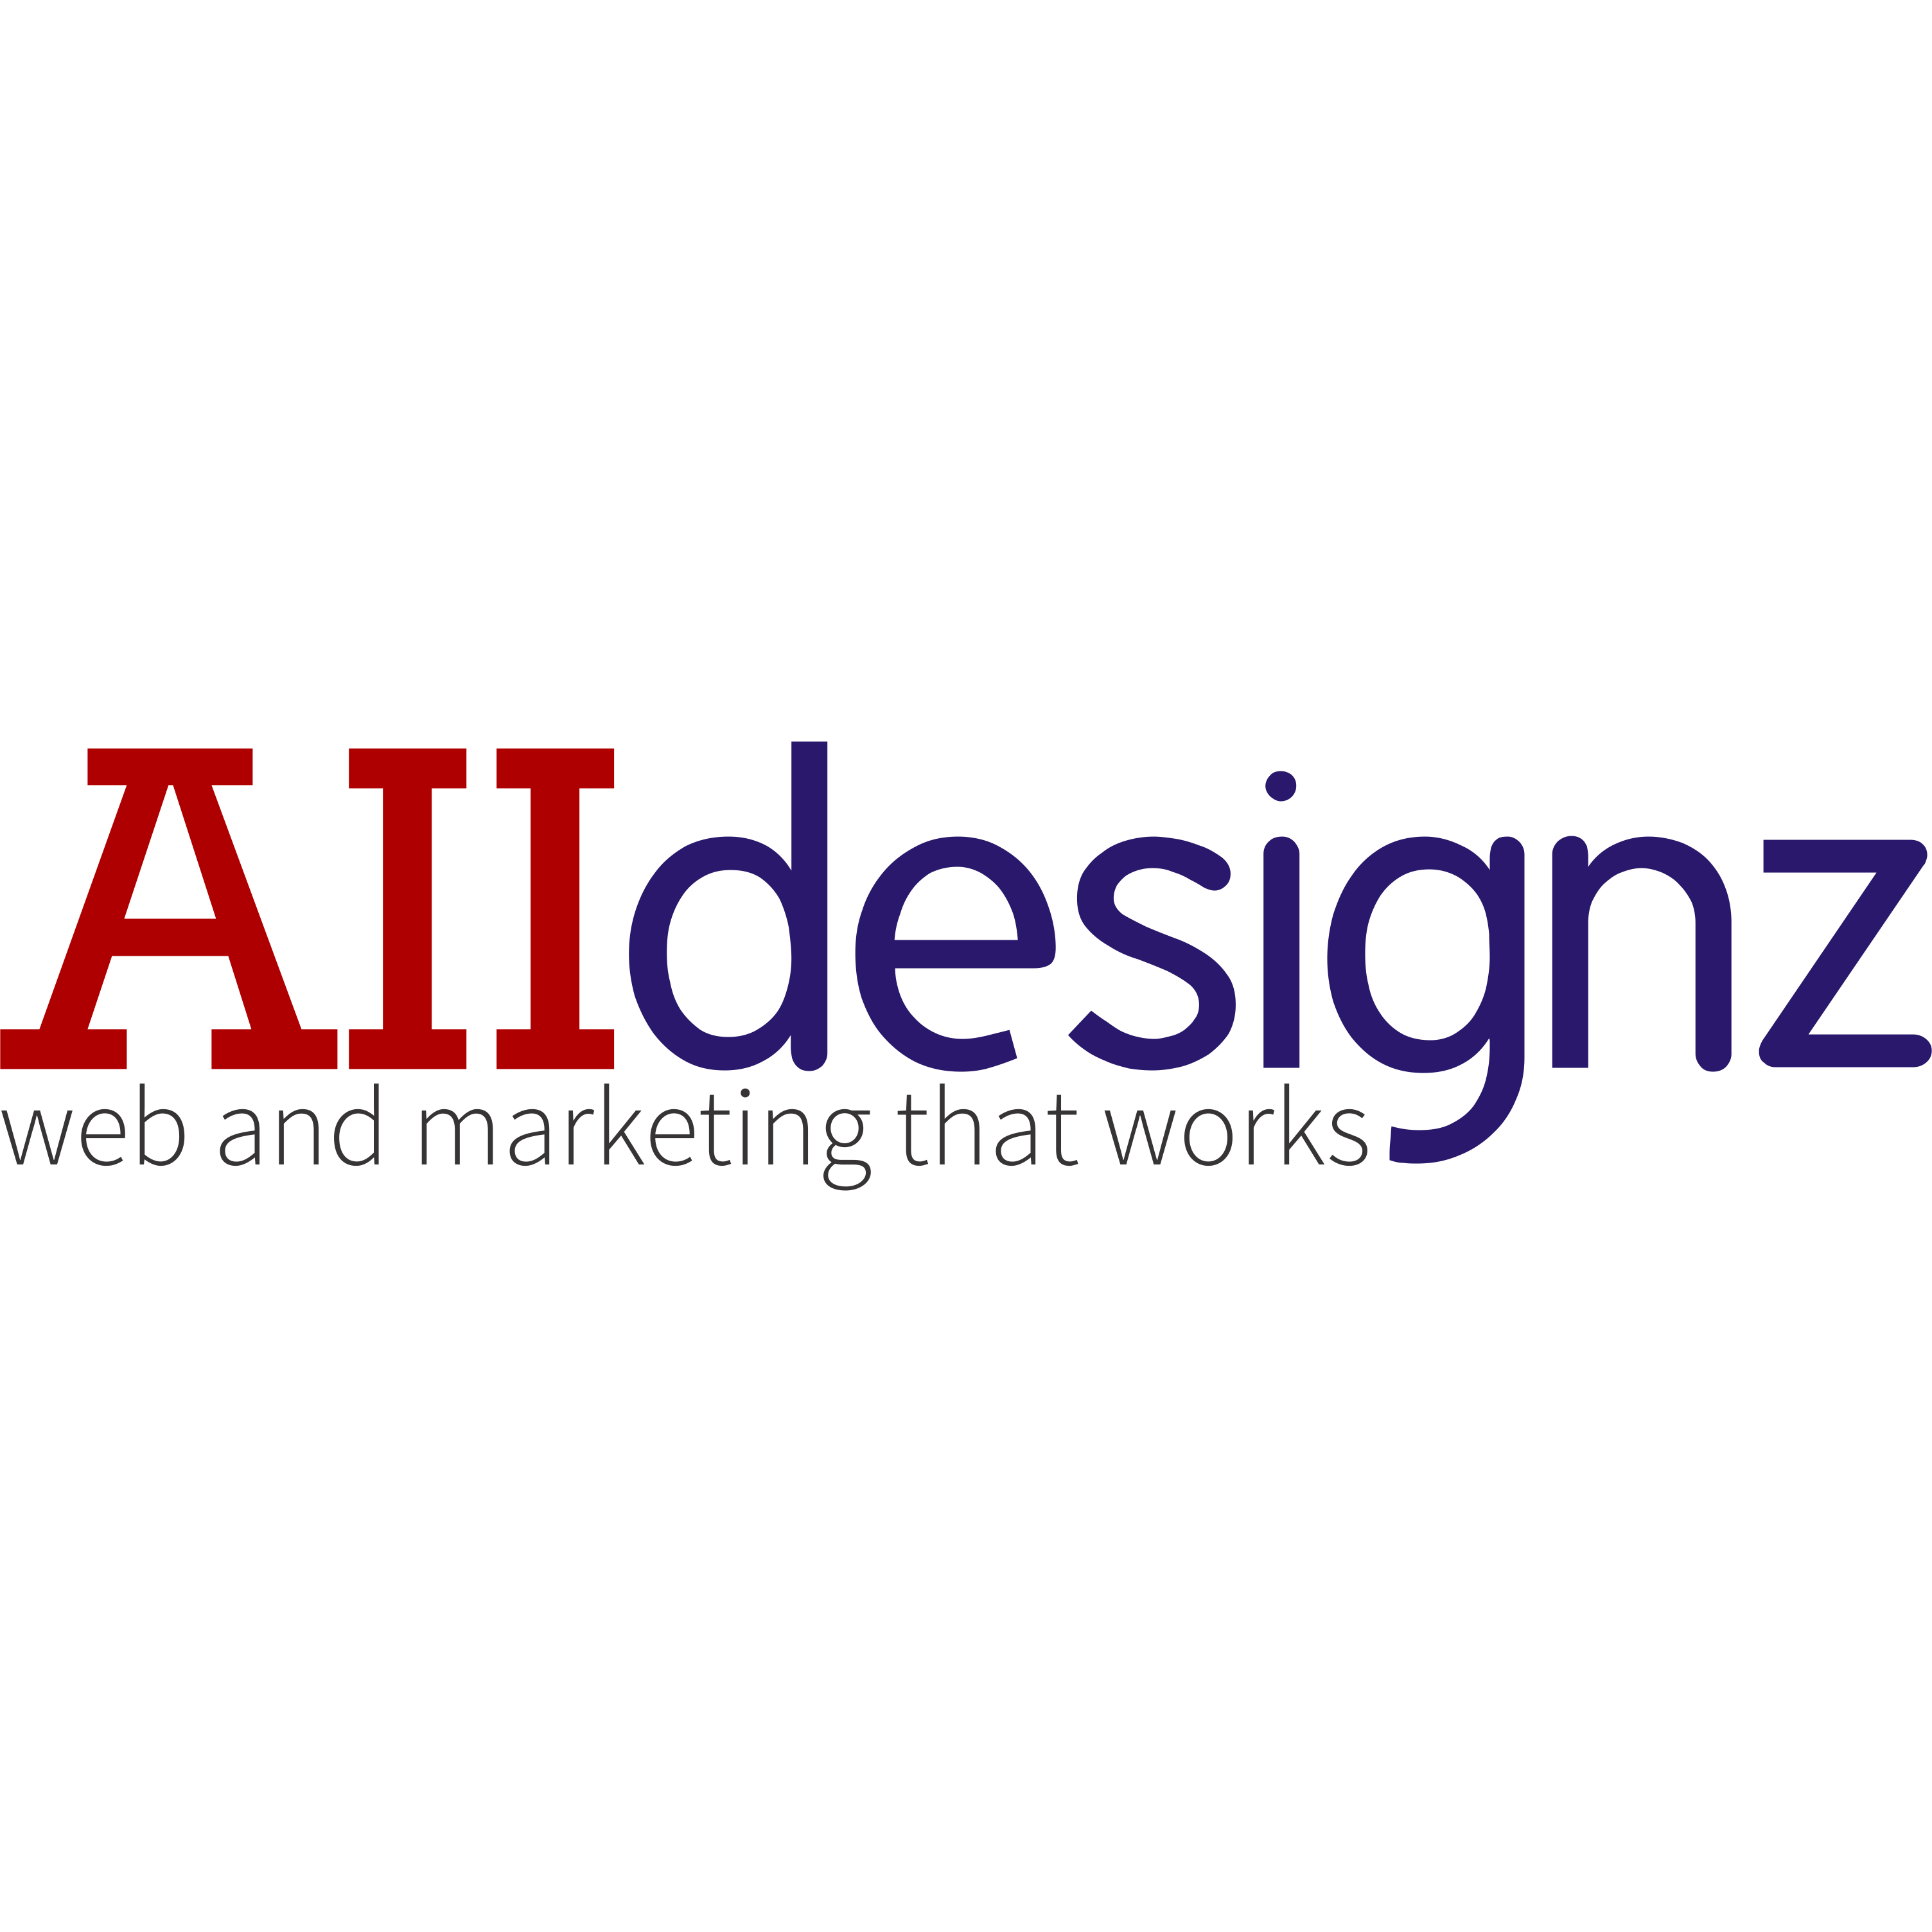 AIIdesignz image 9